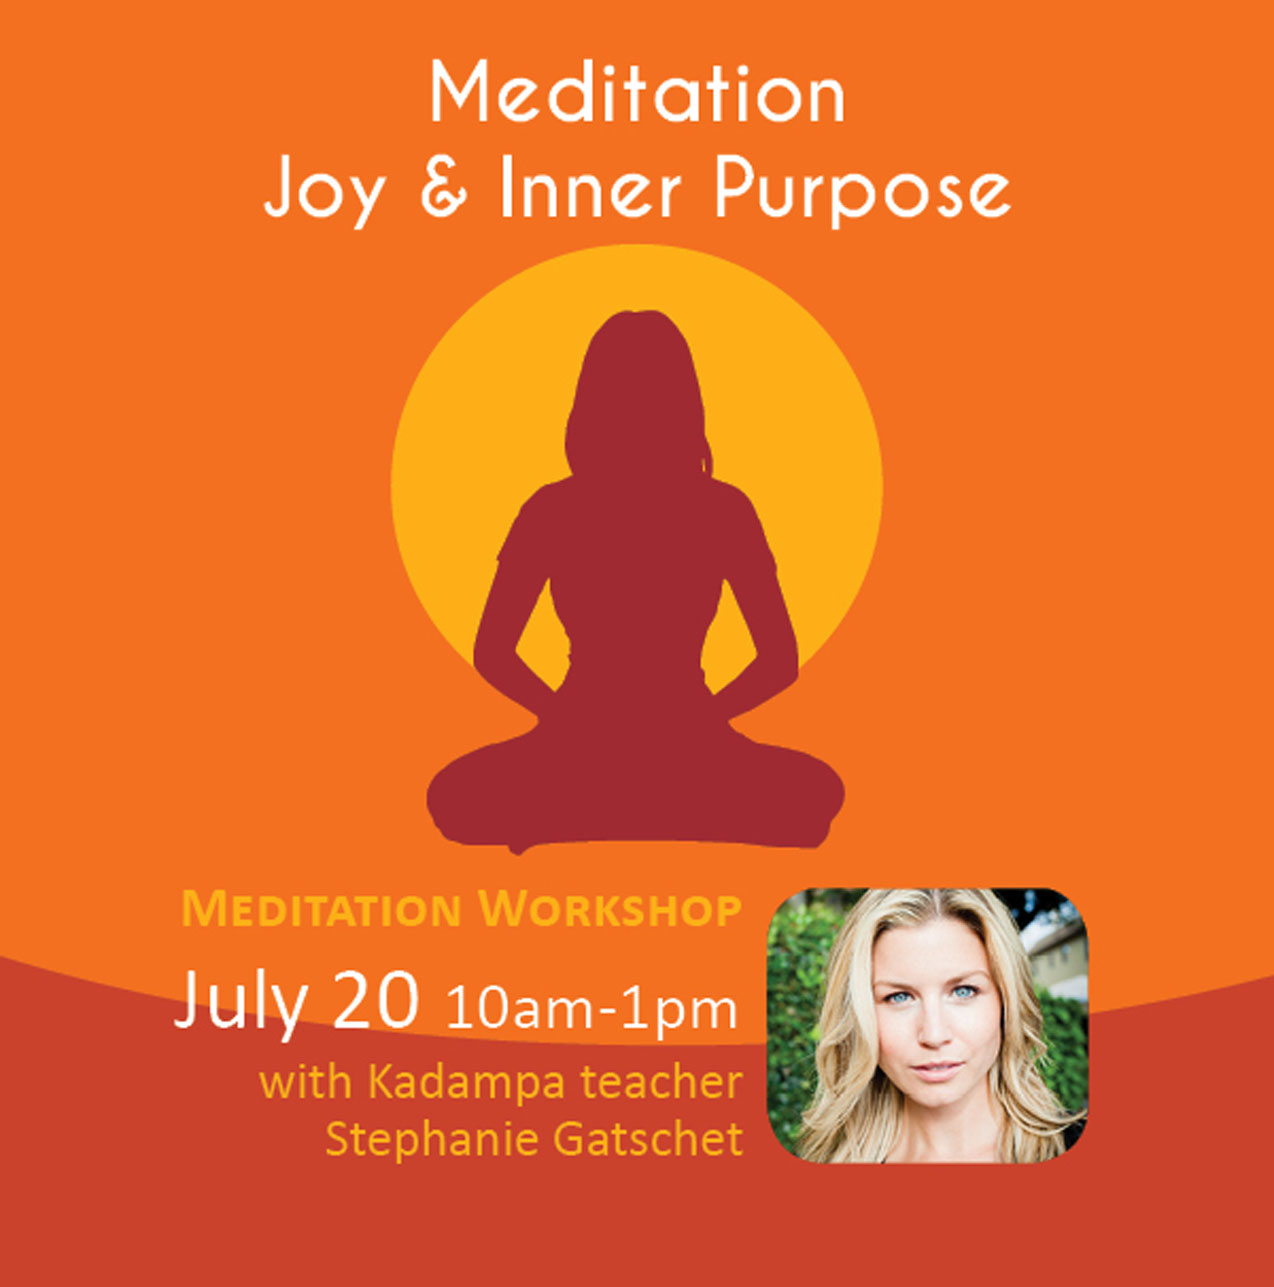 Kadampa Meditation Center San Diego